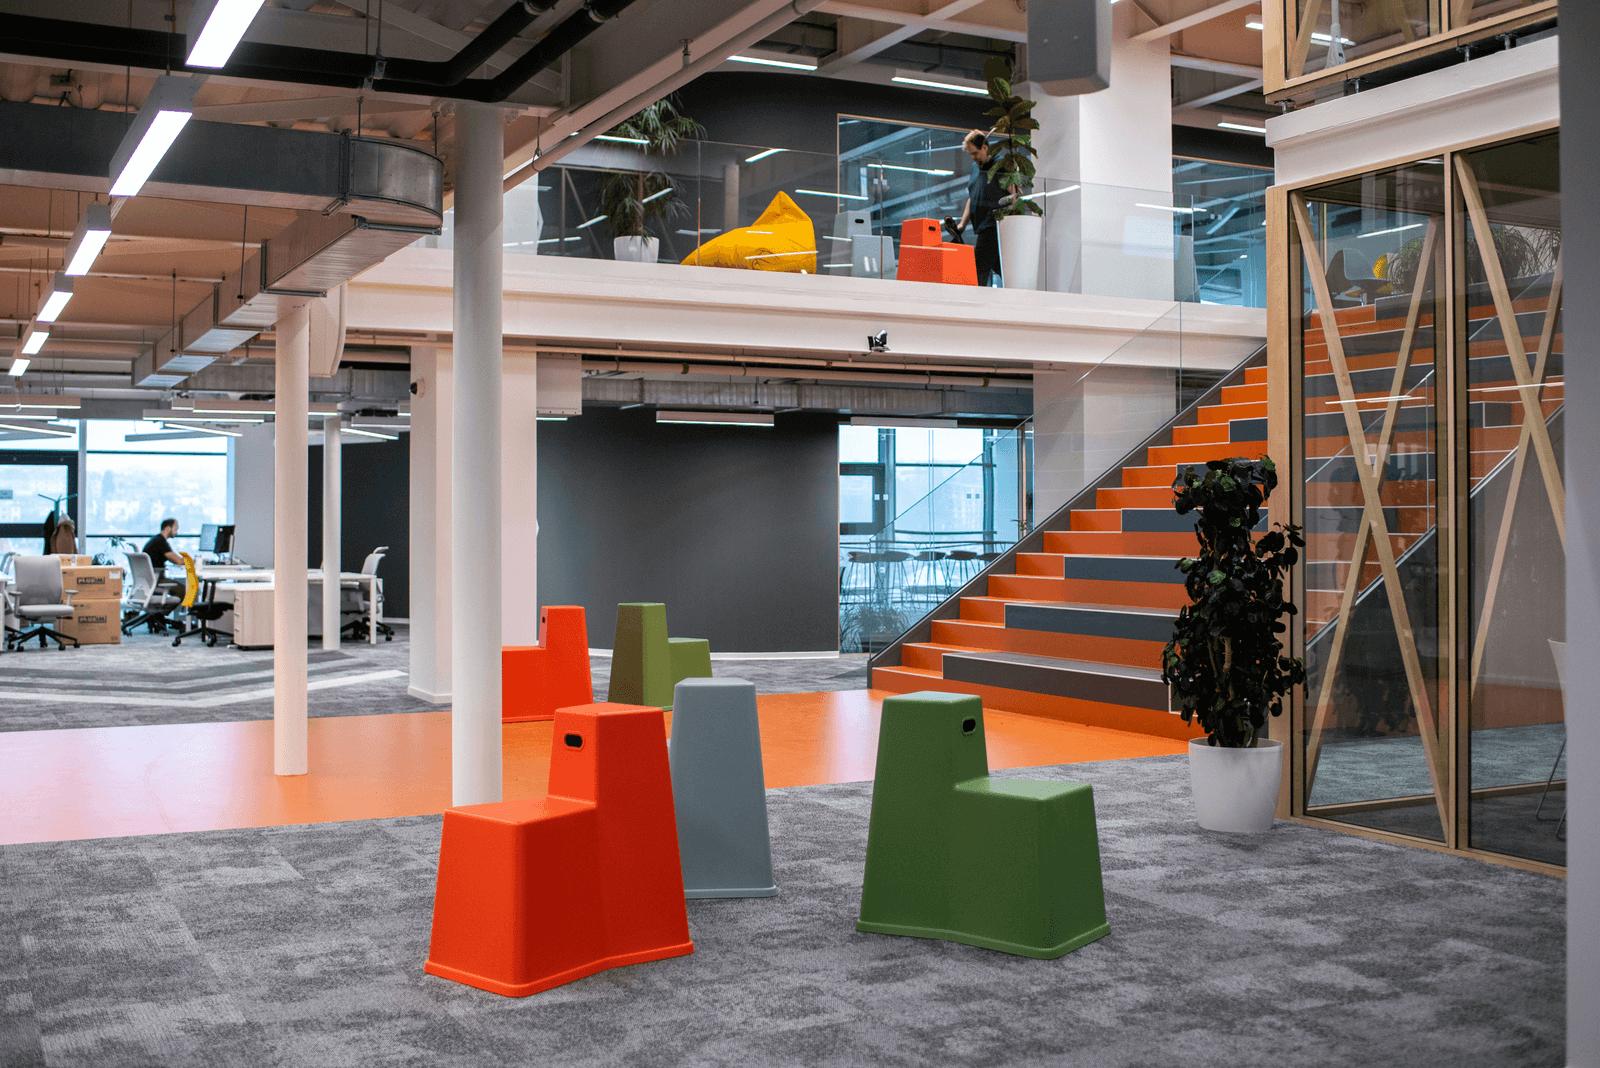 Kiwi.com Brno office